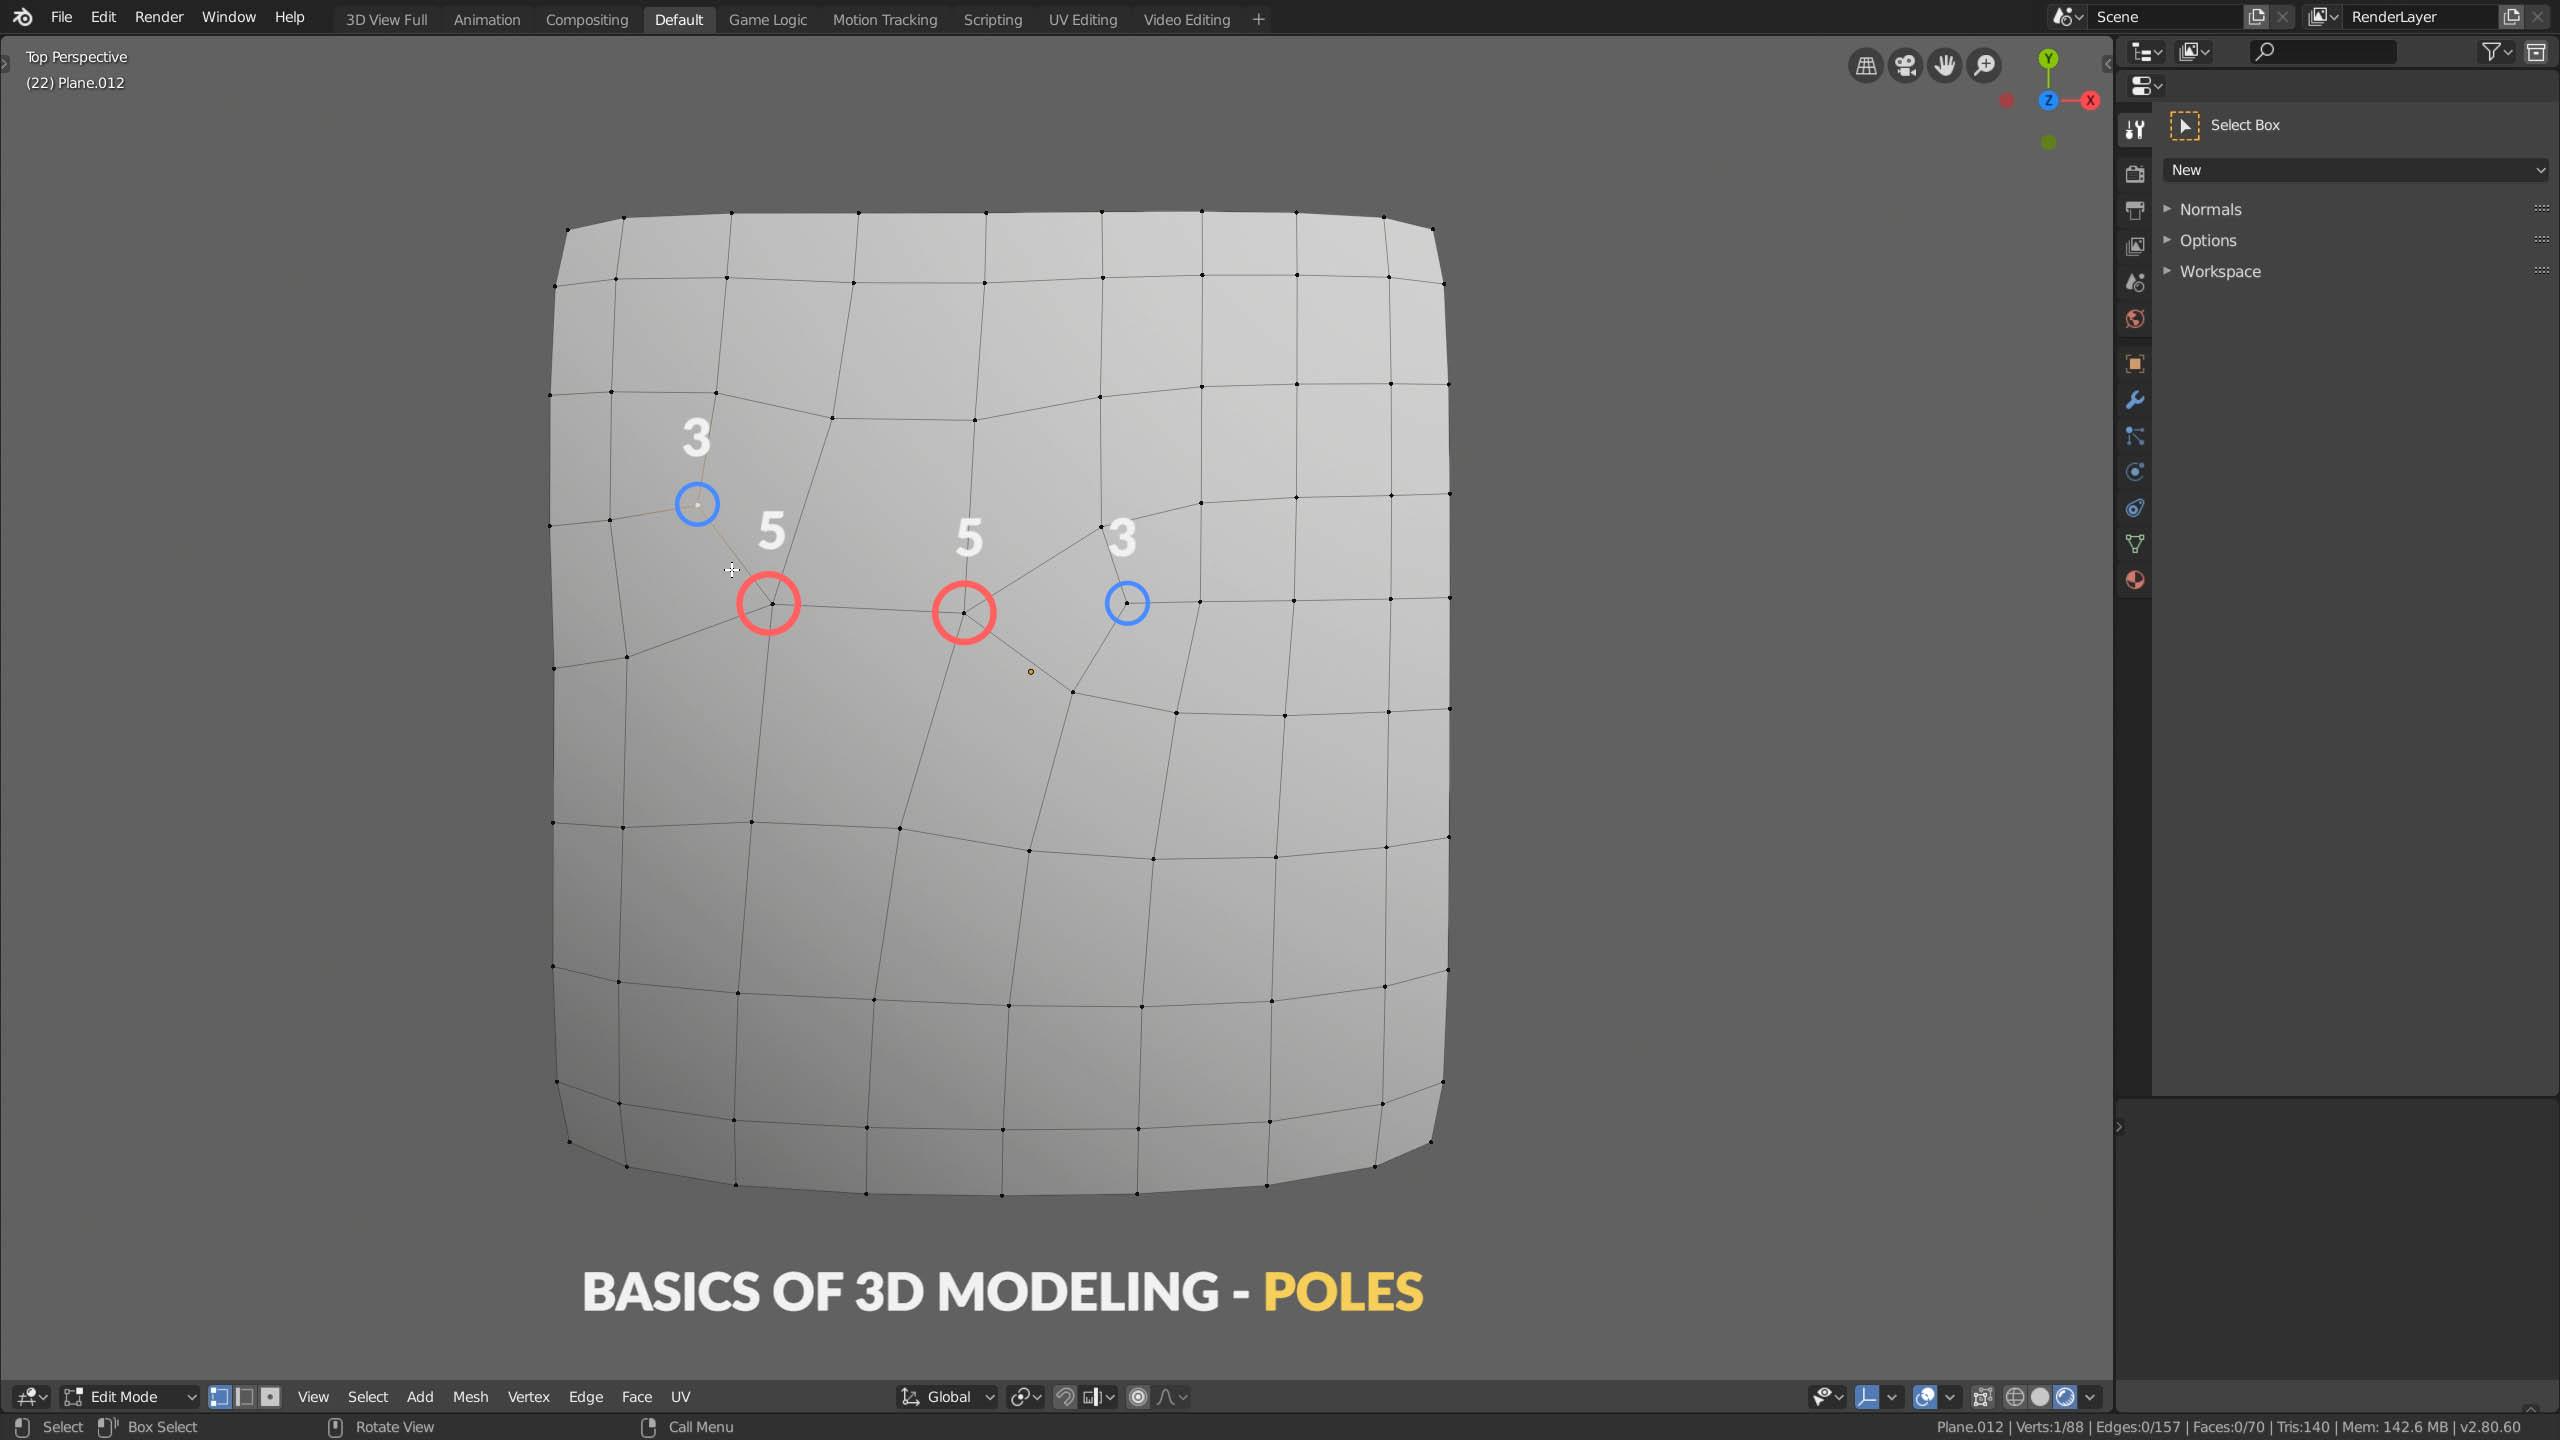 3d modeling basics poles